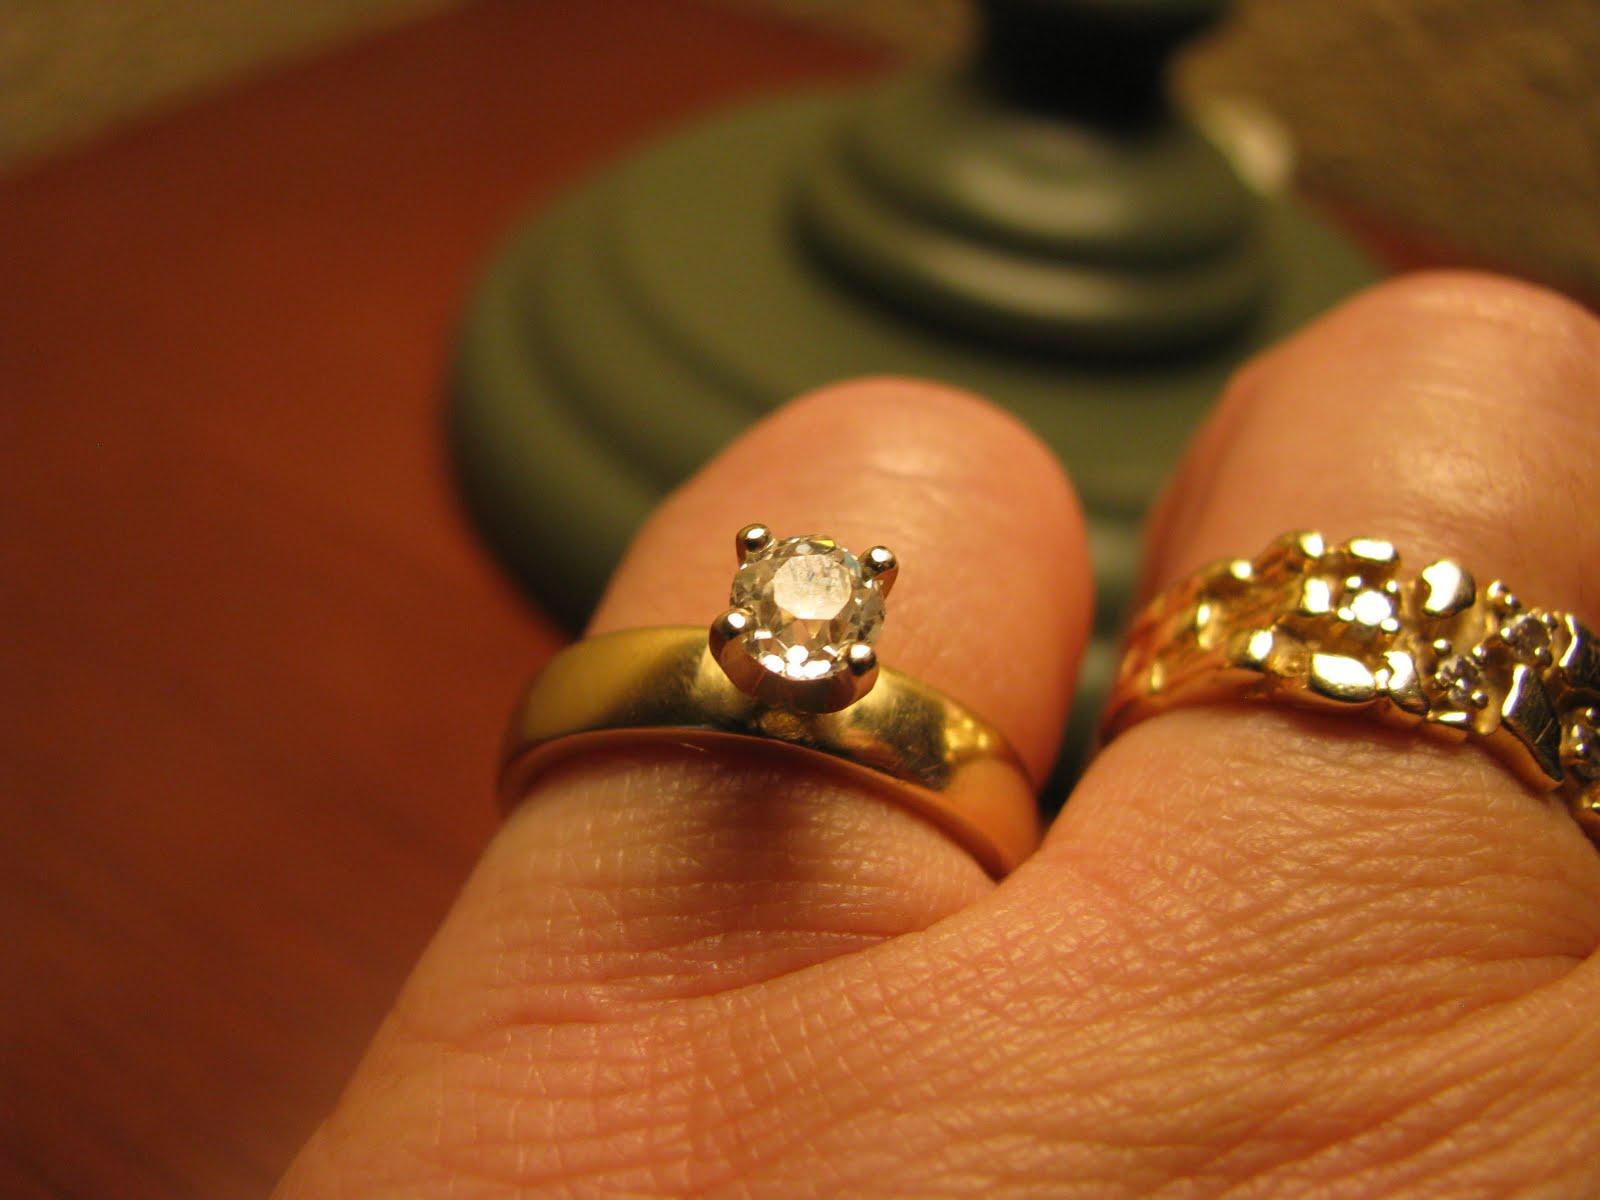 Cool Wedding Ring 2016 Can i upgrade my wedding ring